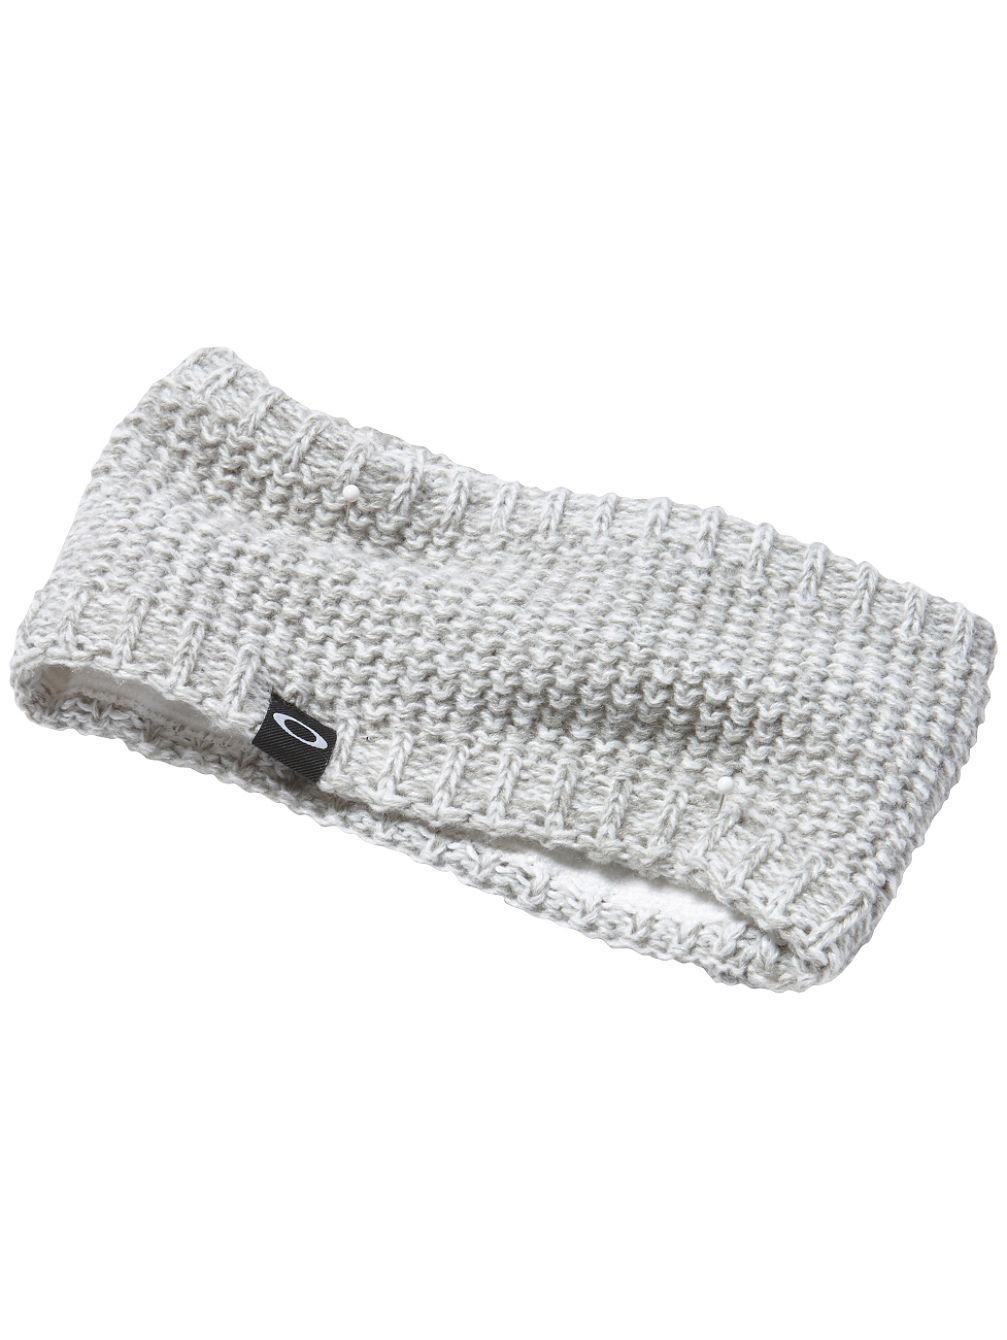 oakley-raven-headband